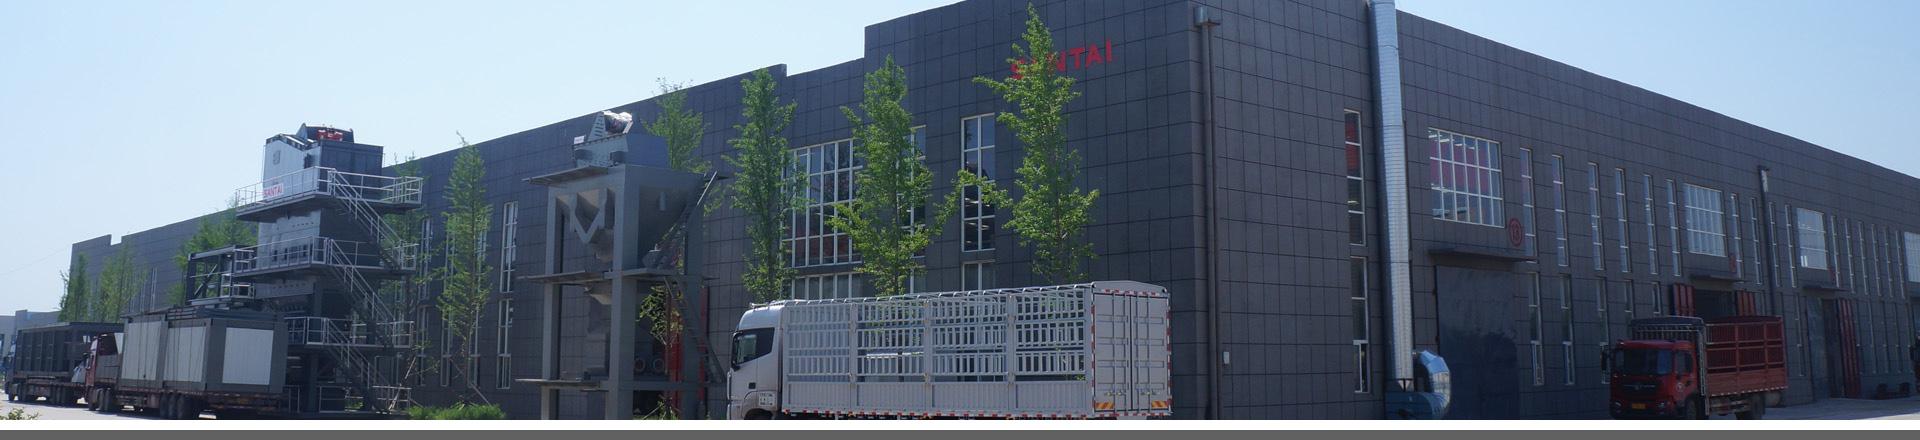 asphalt mixing plant manufacturer supplier in the world